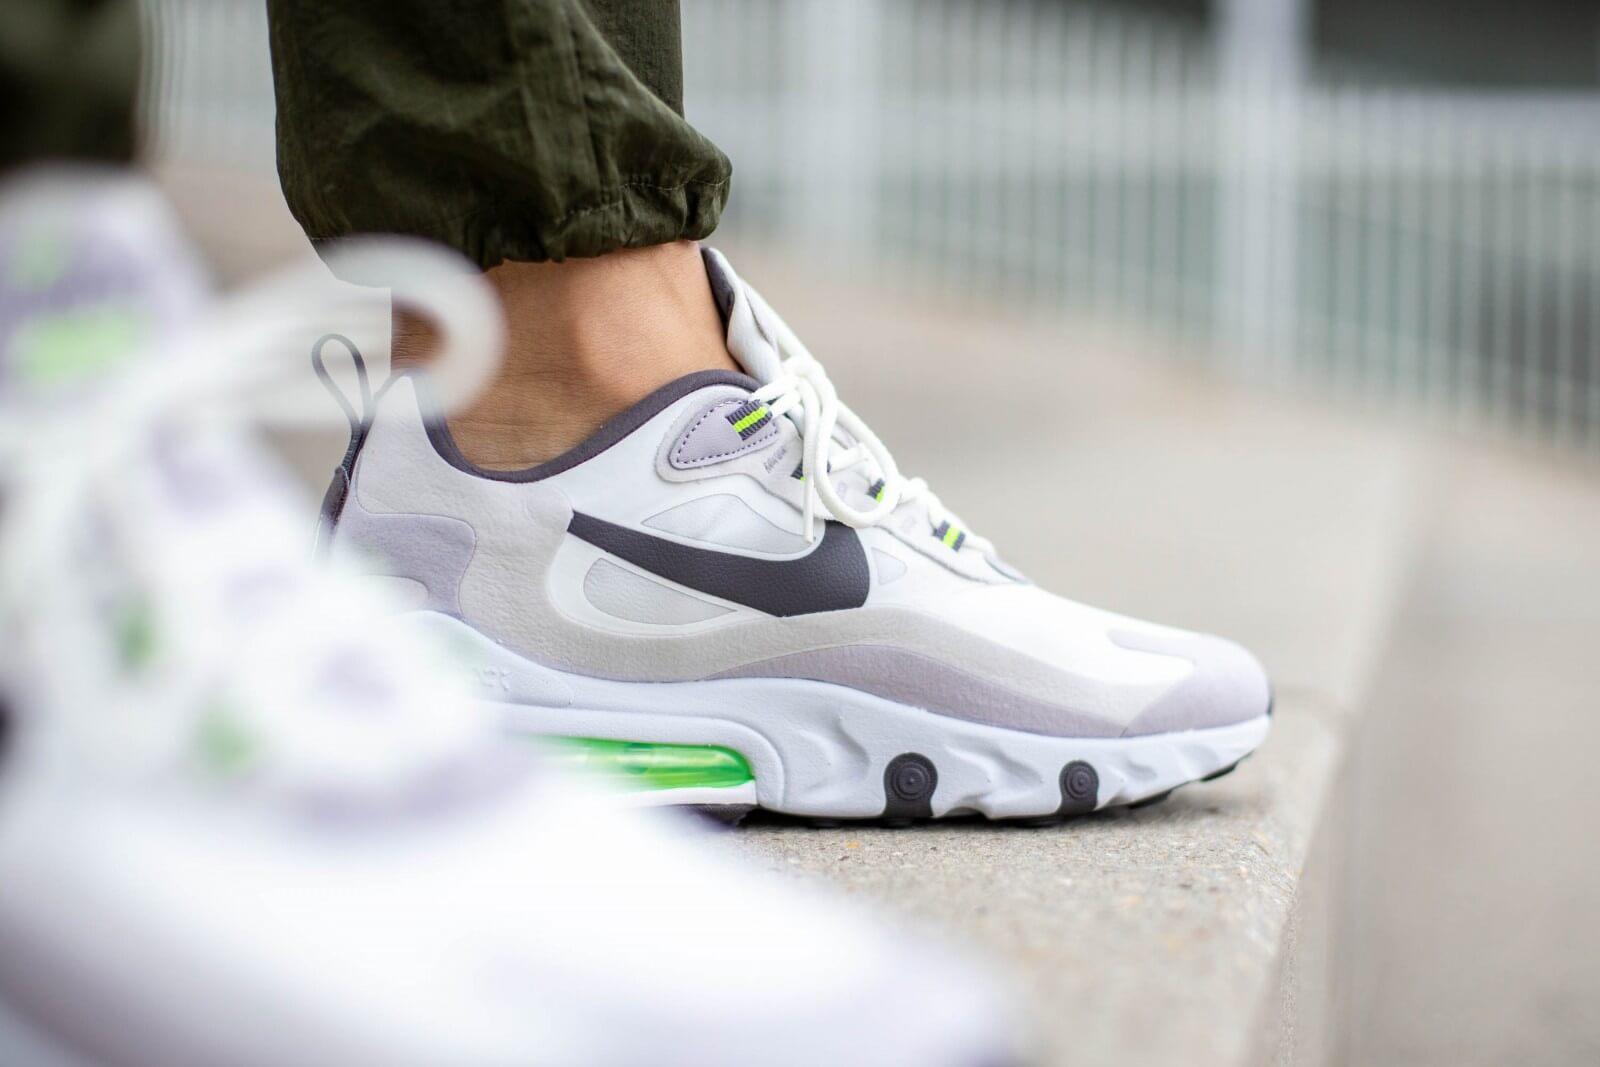 Nike Air Max 270 React Summit White/Electric Green